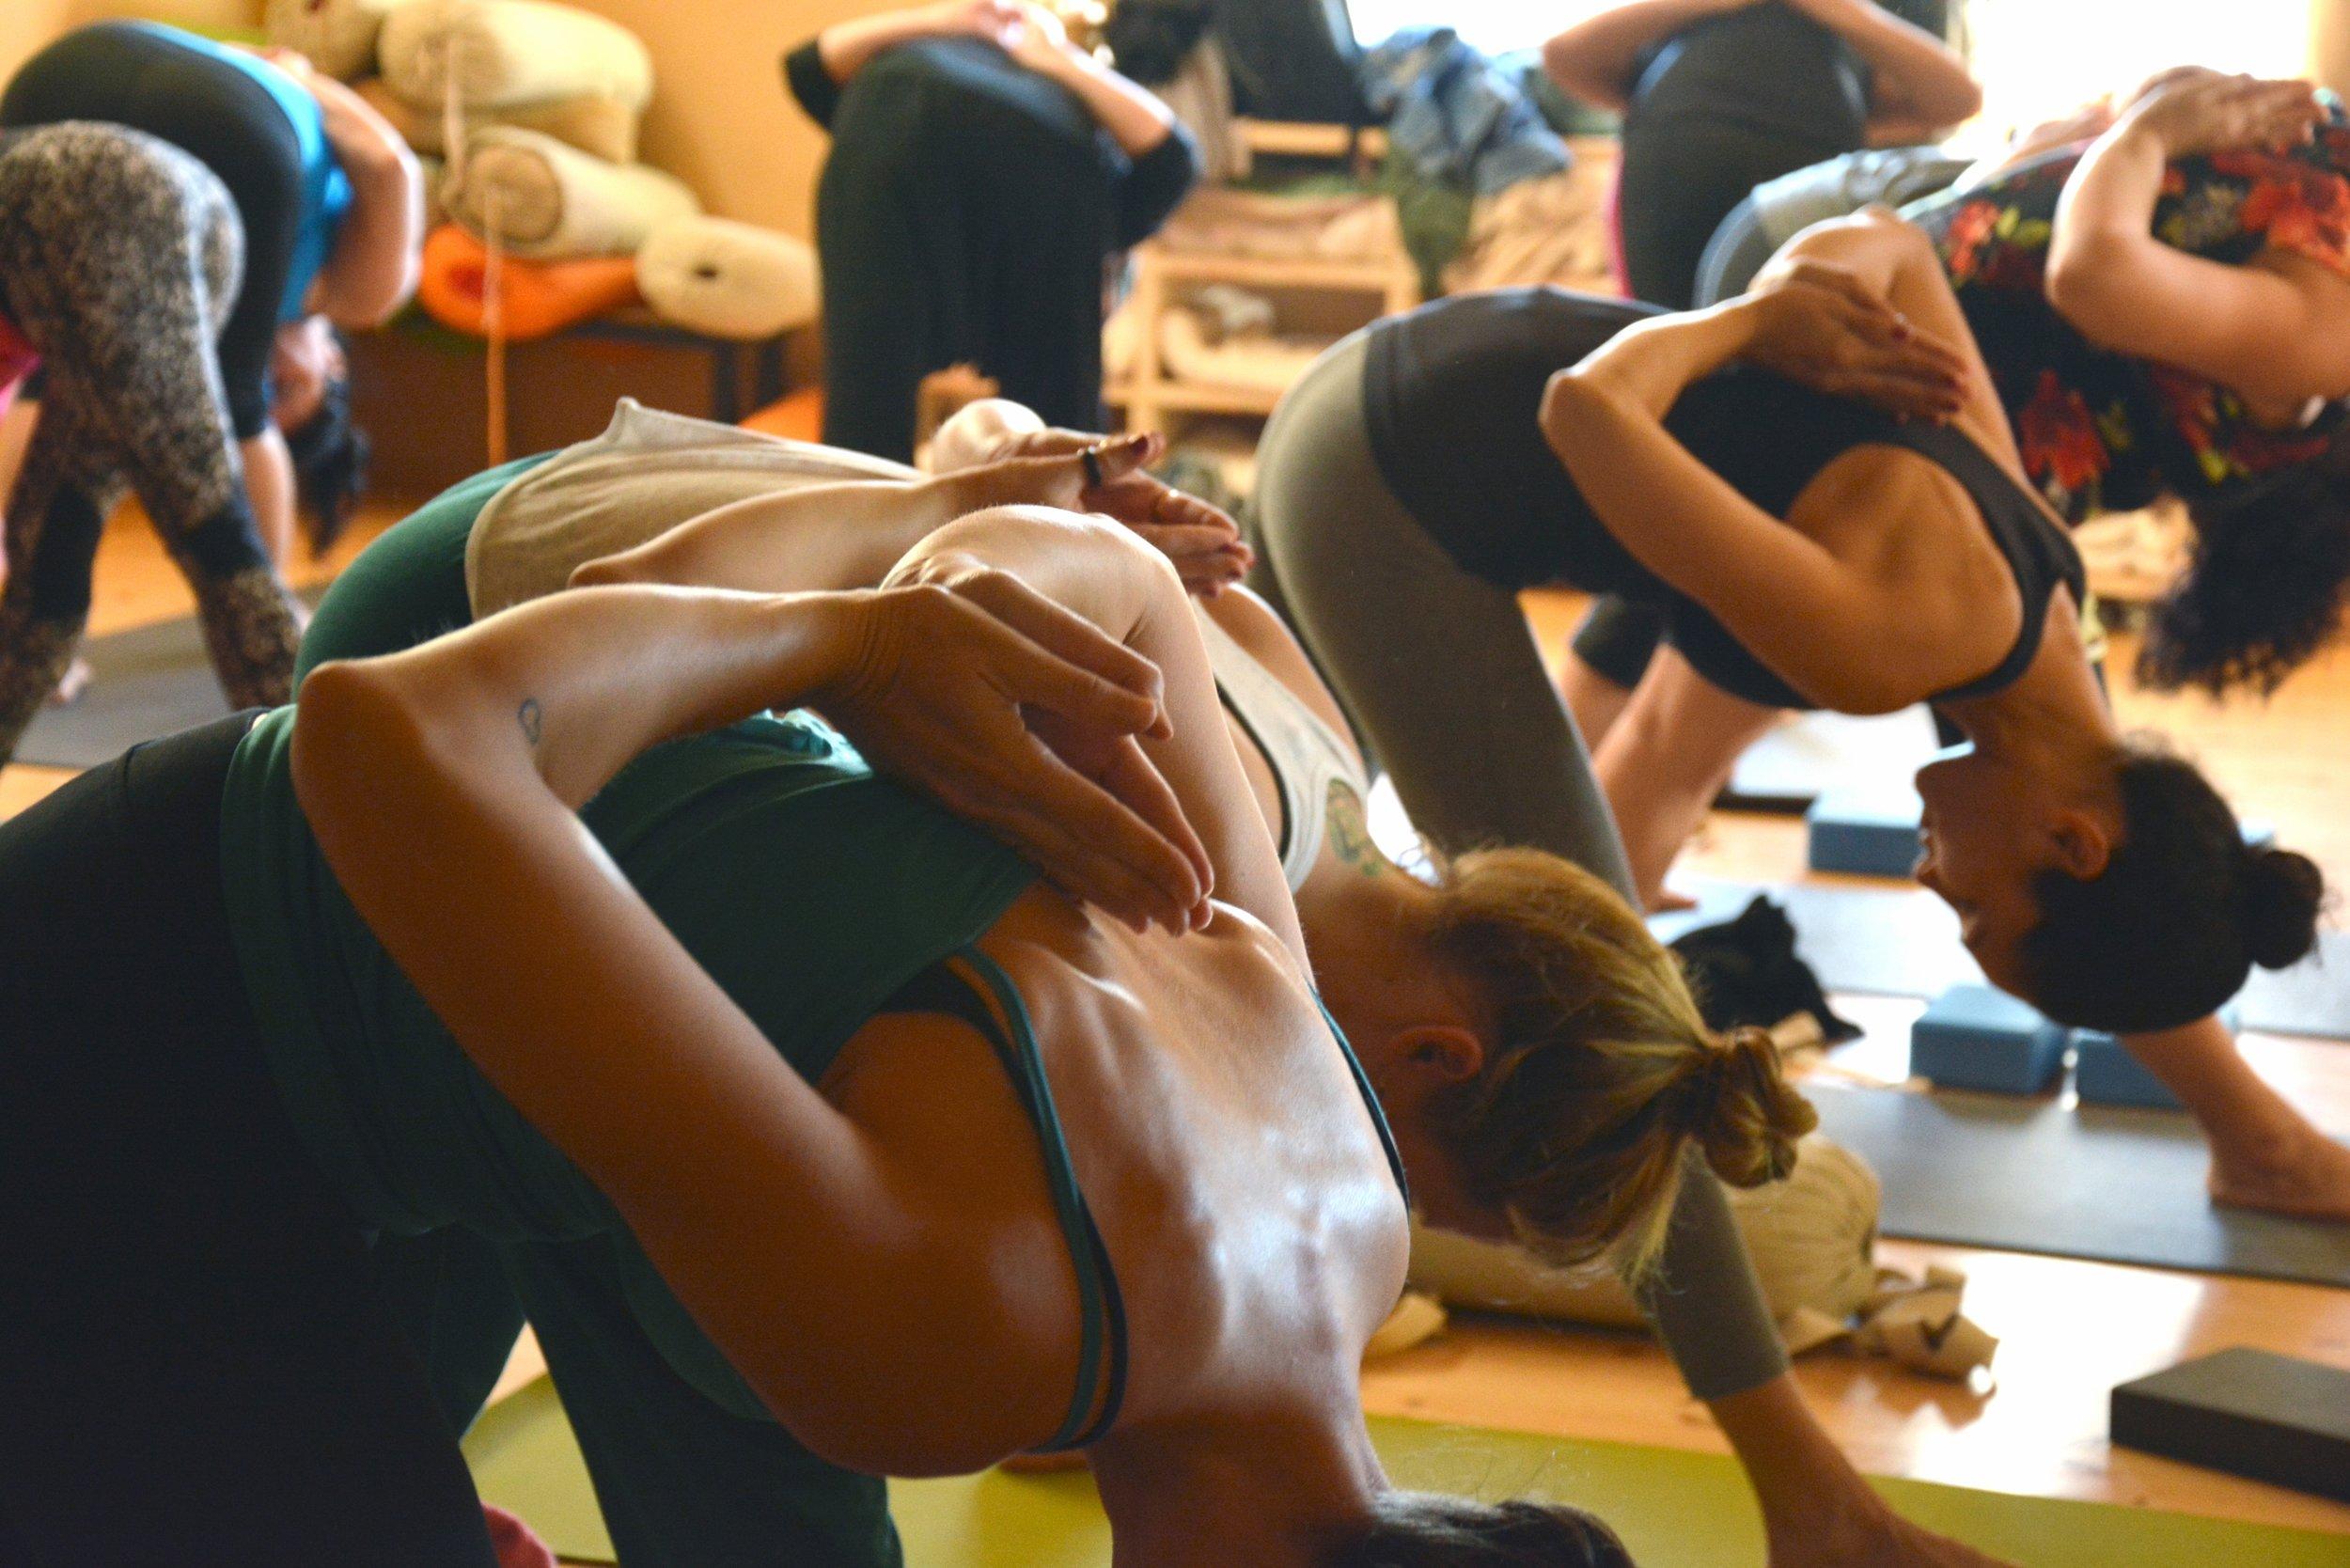 uwm.group-female-exercise-fitness-workout-meditation-1199720-pxhere.com